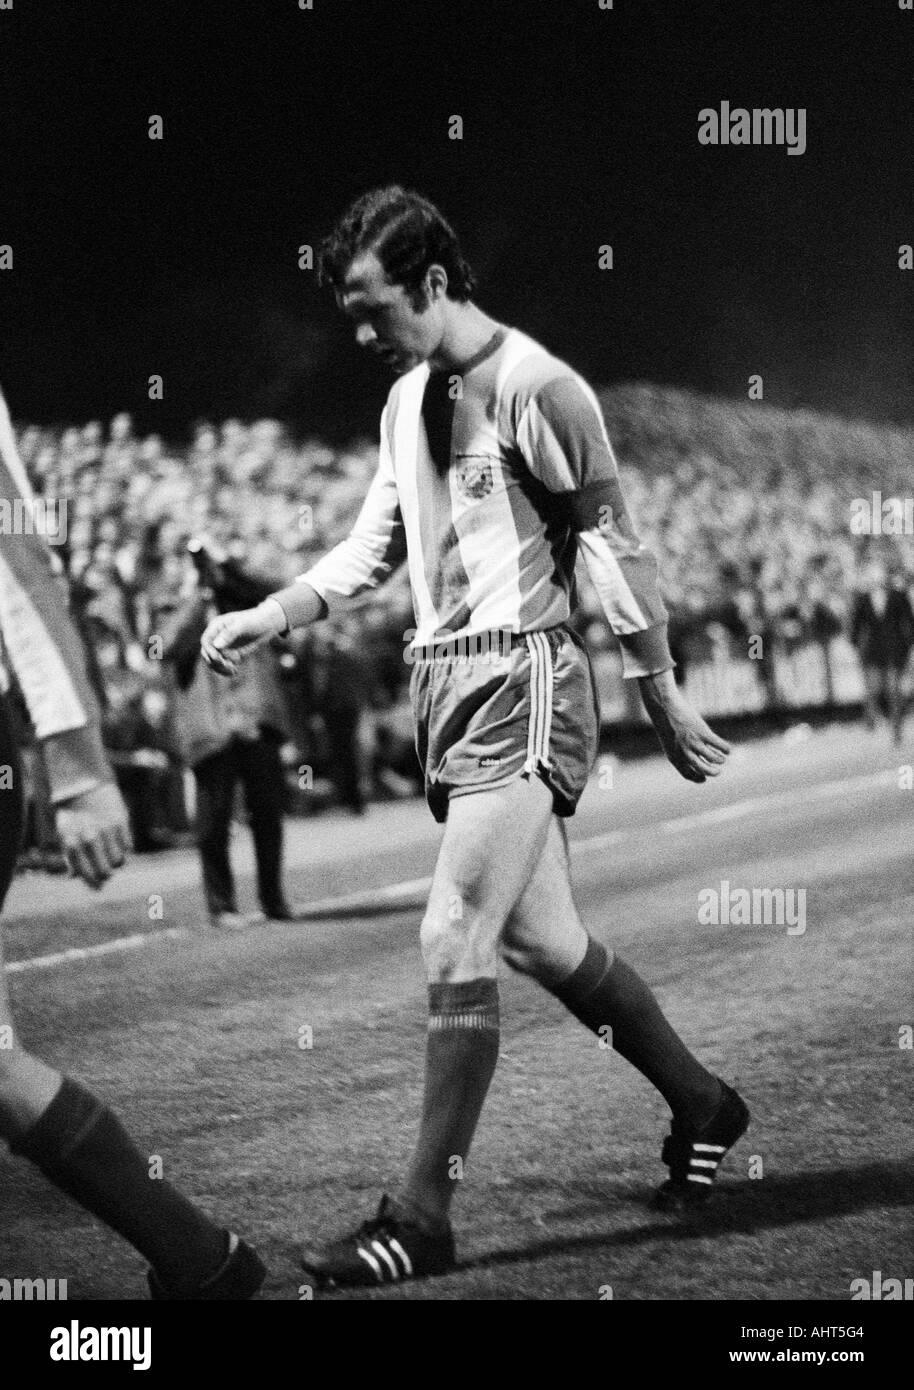 football, Bundesliga, 1970/1971, Boekelberg Stadium in Moenchengladbach, Borussia Moenchengladbach versus FC Bayern Munich 3:1, football player, team captain Franz Beckenbauer (FCB) - Stock Image